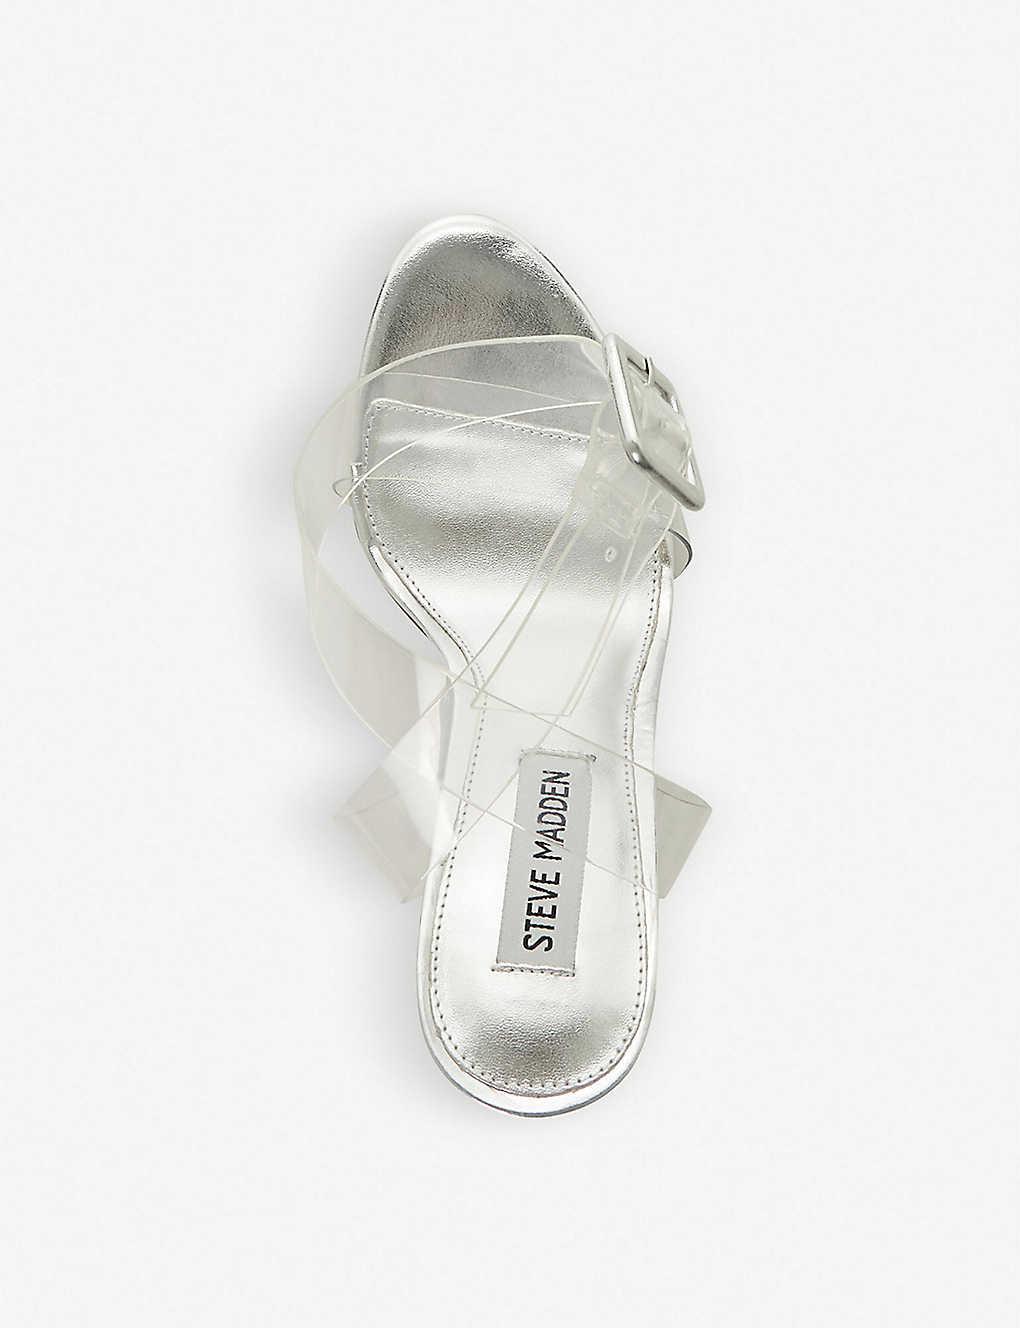 951a2ed8fe7 STEVE MADDEN - Seeme two-part pvc sandals | Selfridges.com